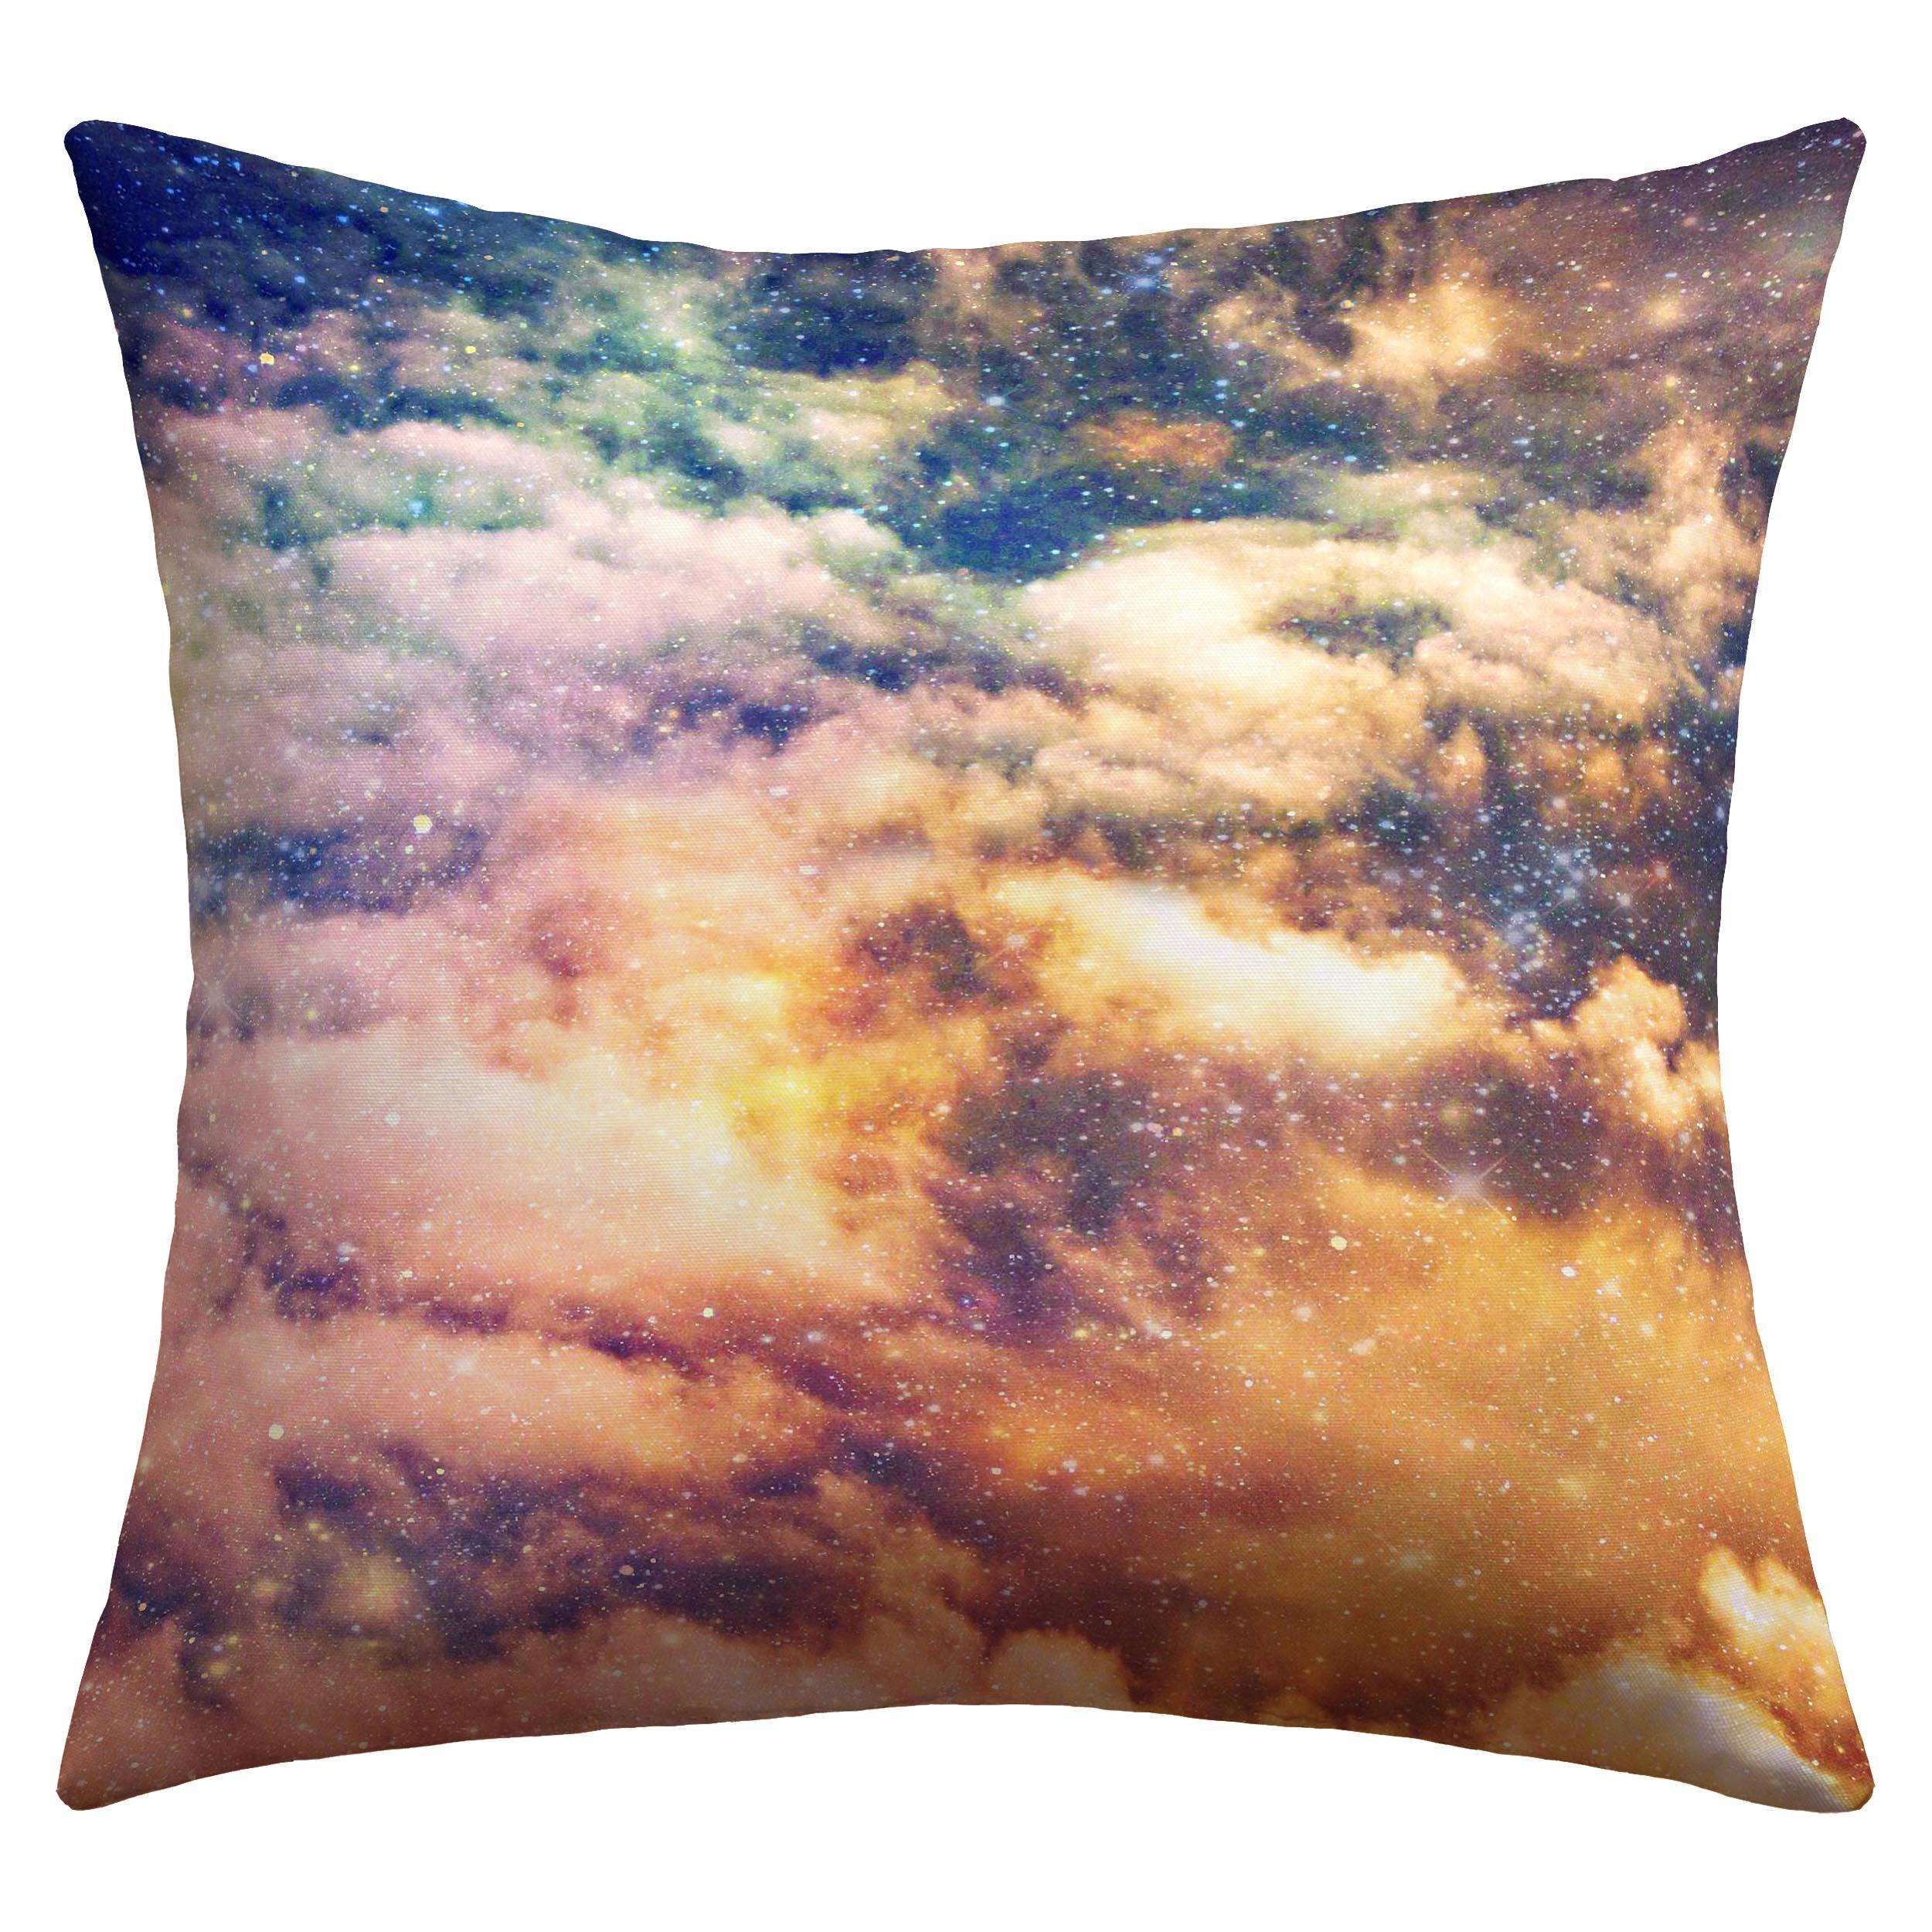 Deny Designs Shannon Clark Cosmic Outdoor Throw Pillow, 20 x 20